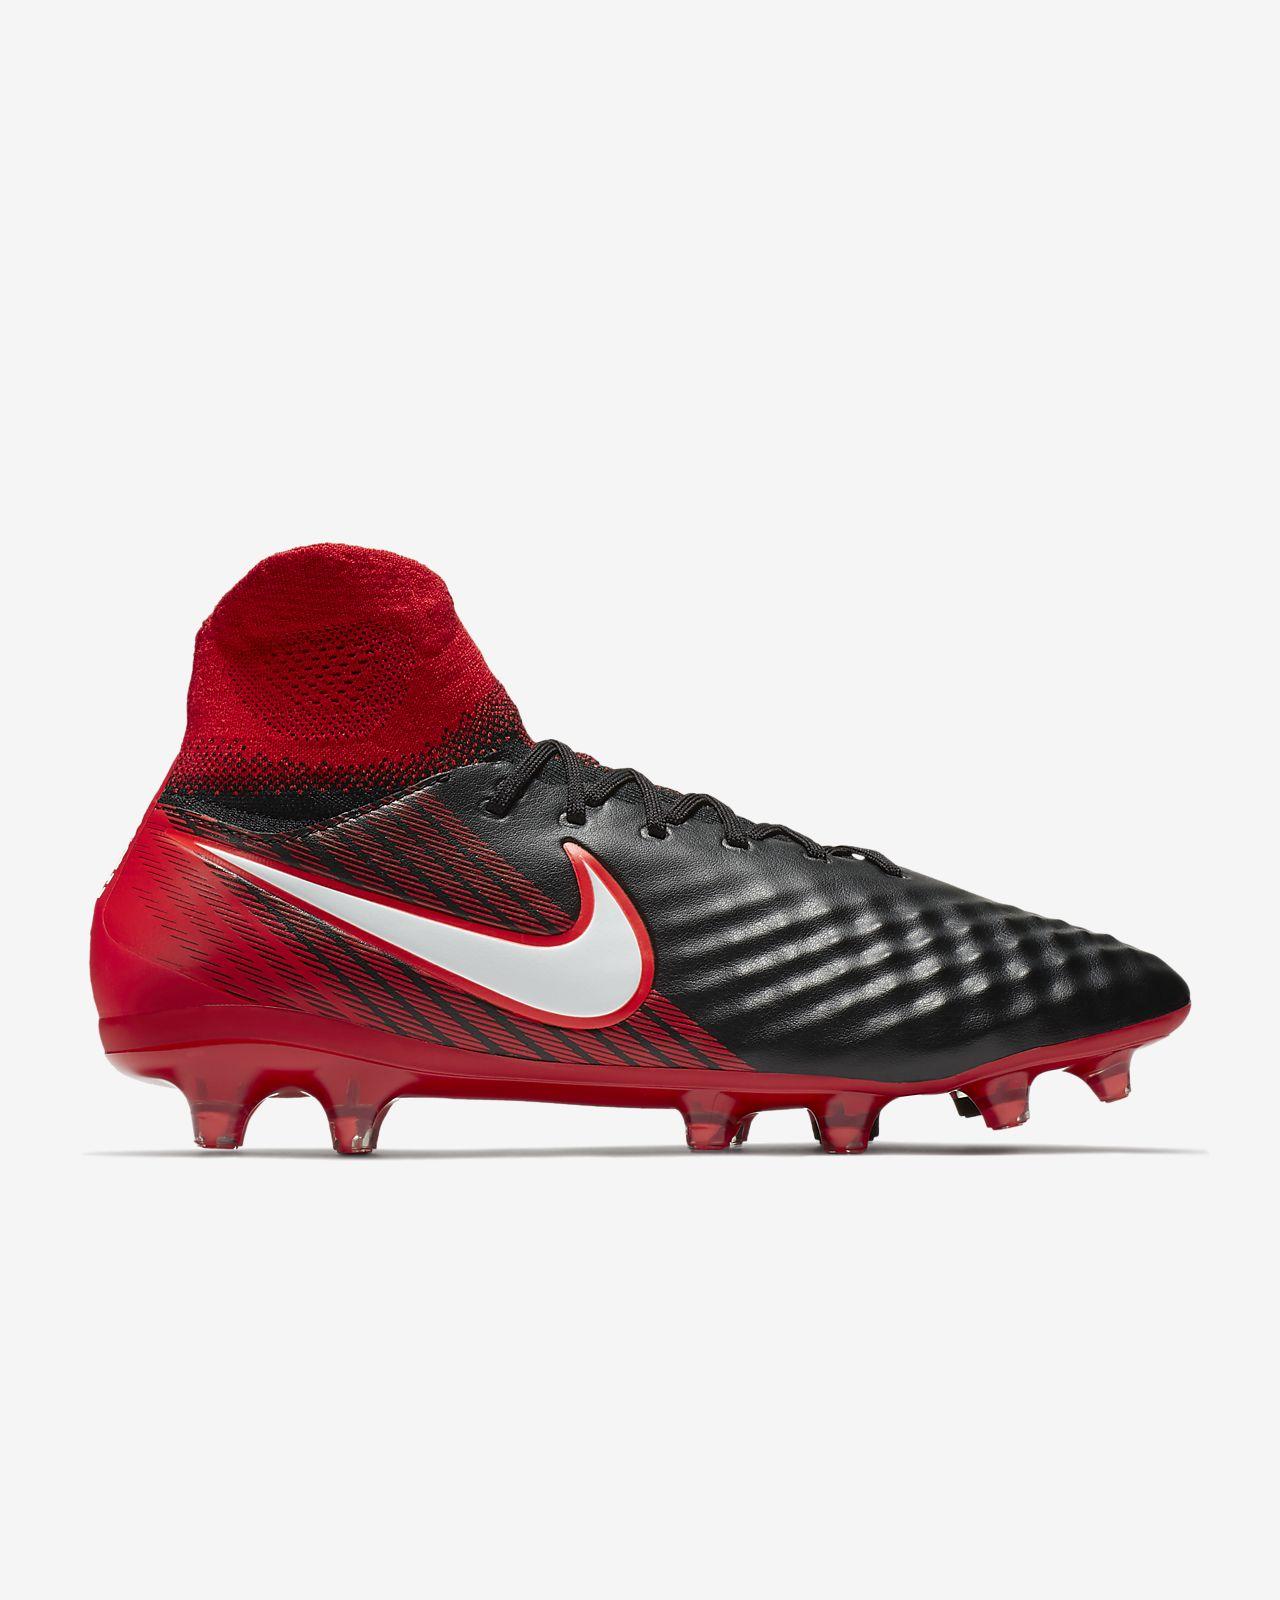 ... Nike Magista Orden II Firm-Ground Football Boot